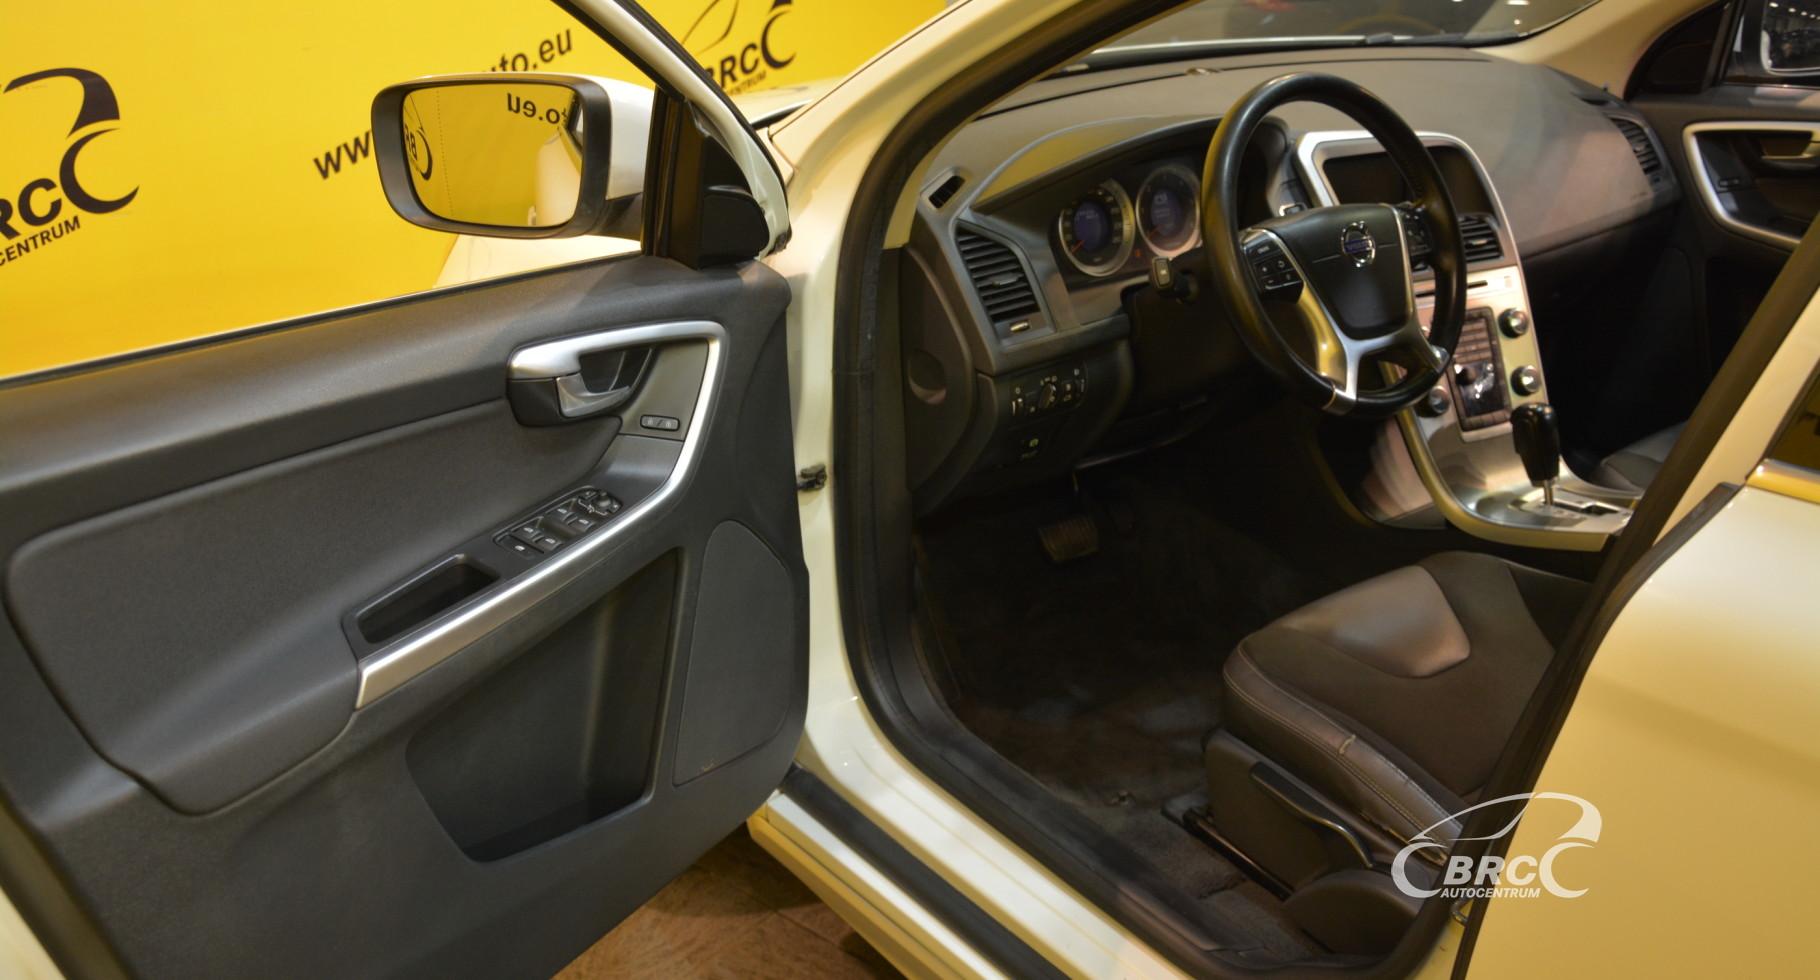 Volvo XC 60 D5 AWD Automatas